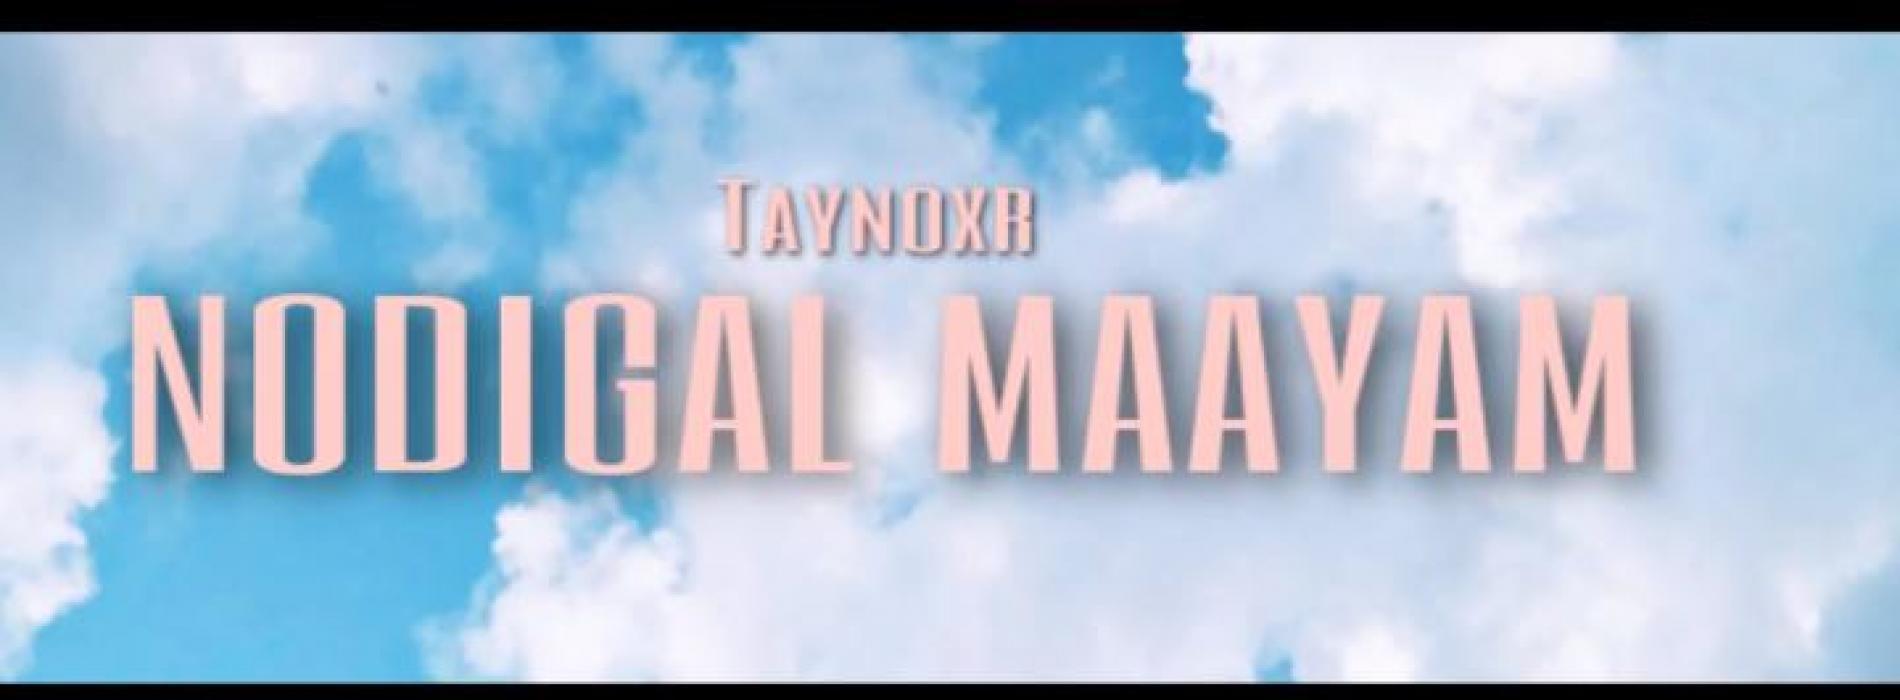 New Music : Taynoxr – Nodigal Mayam (official audio)